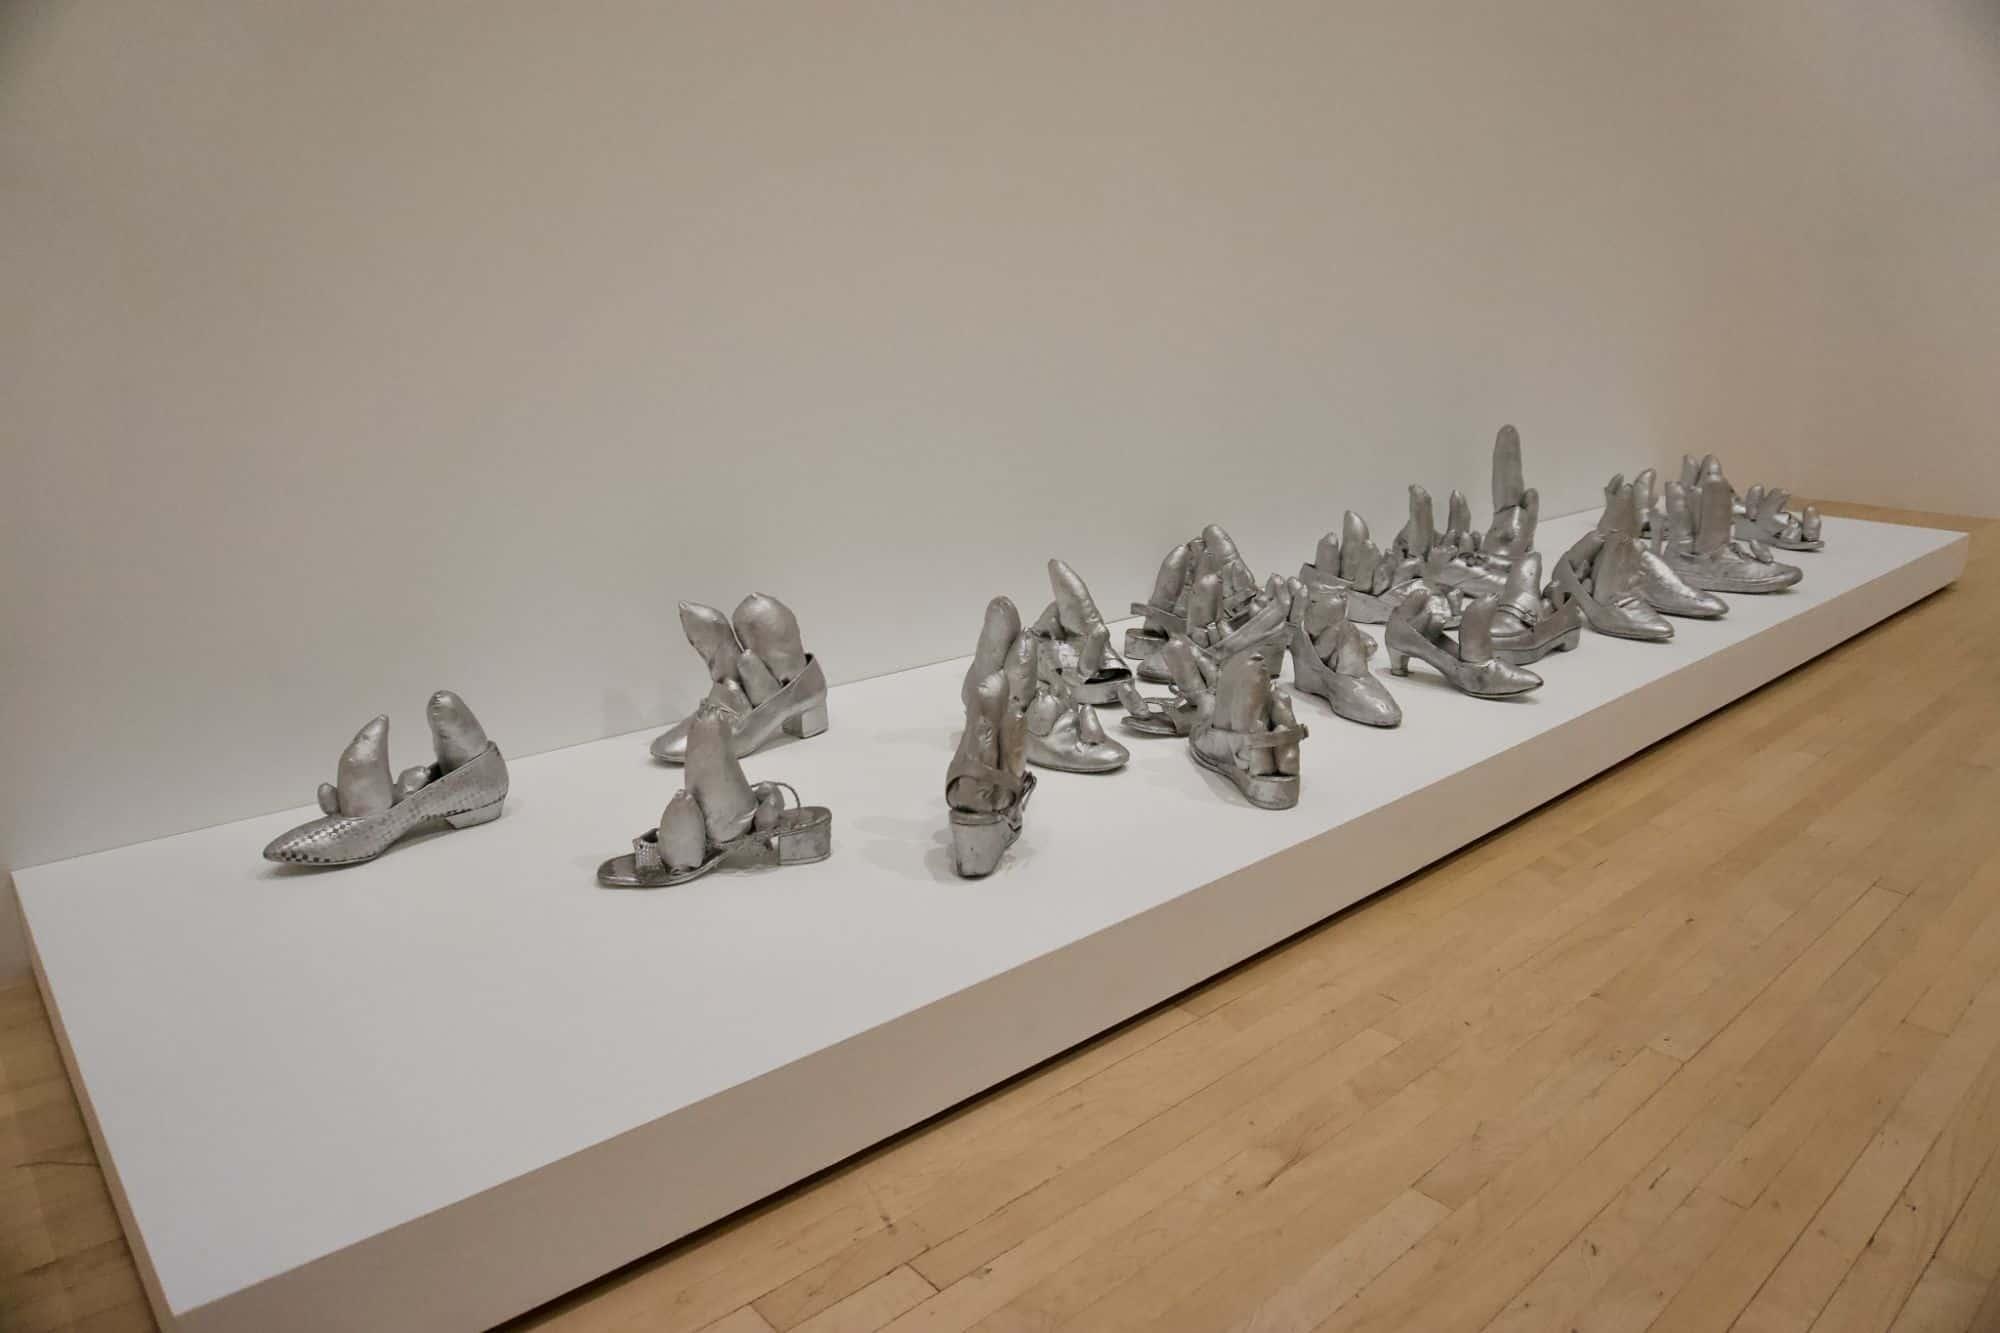 Artwork at MOCA